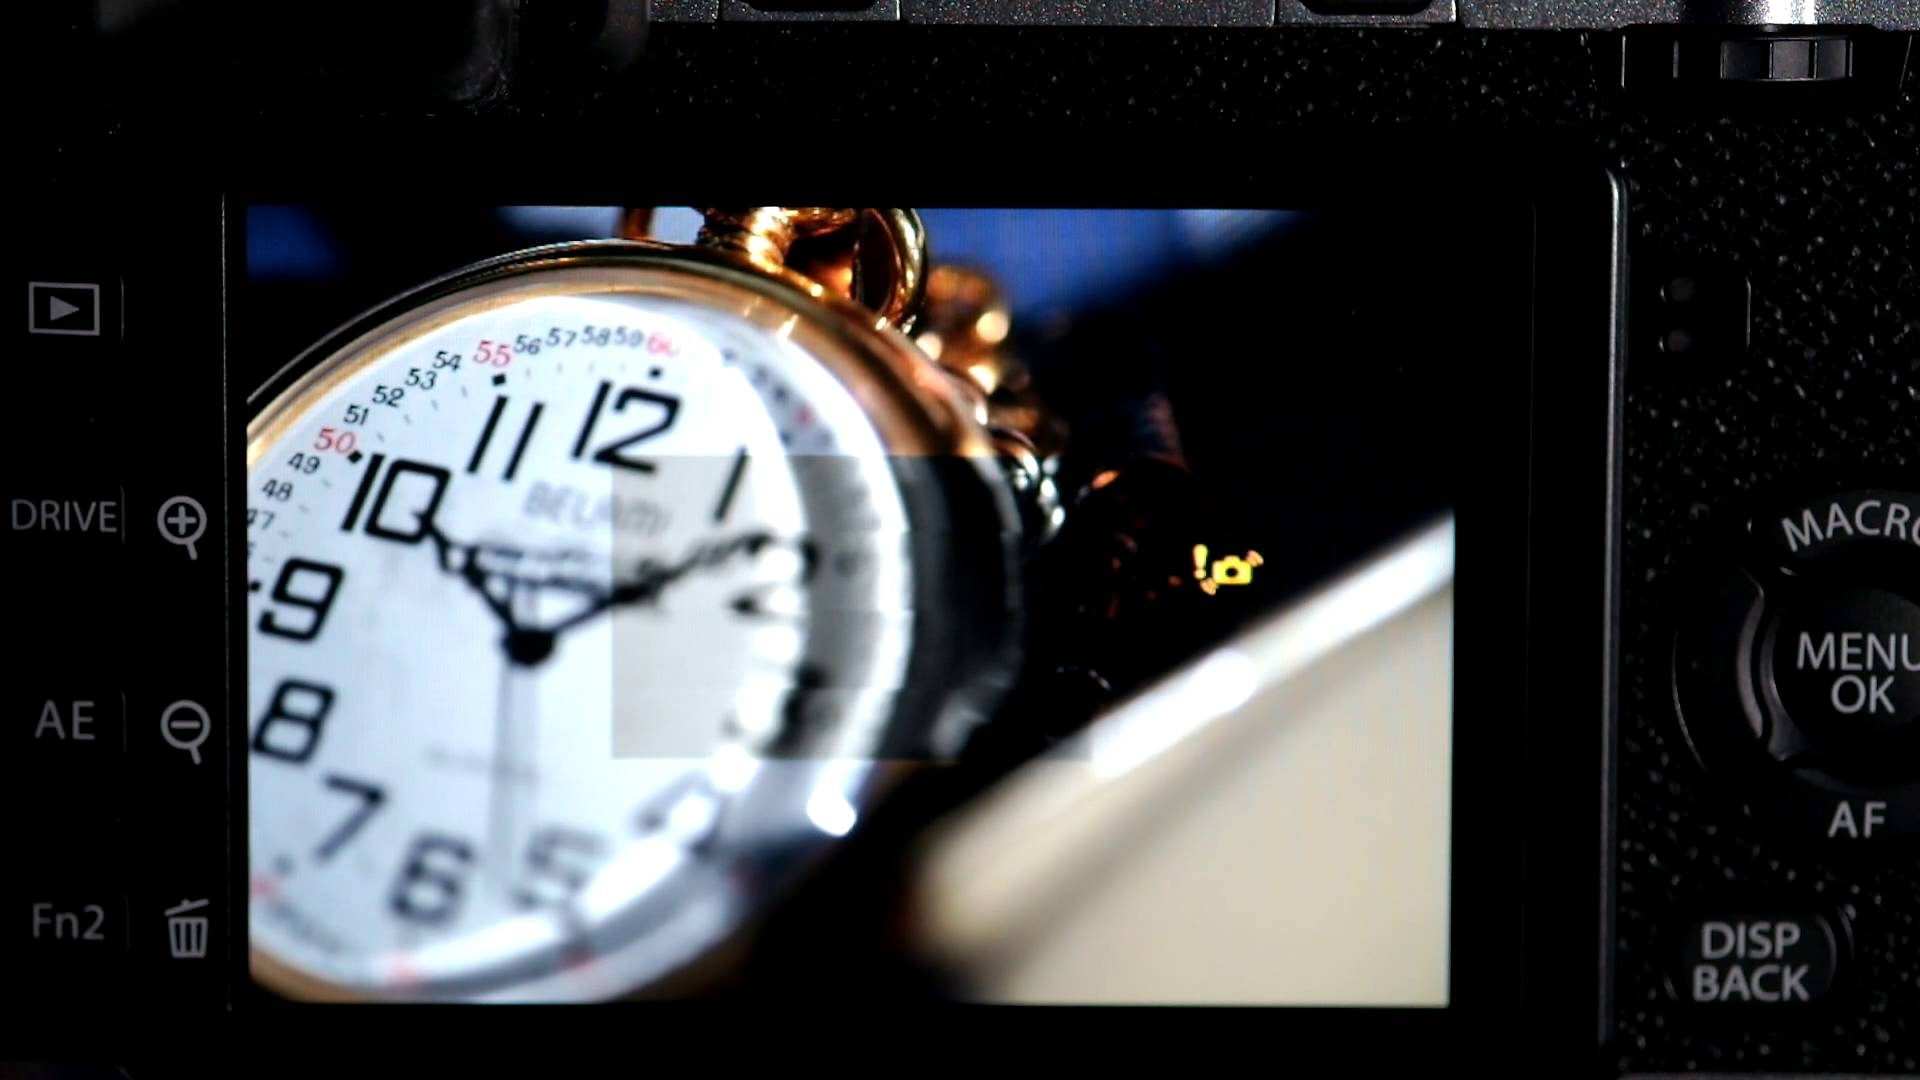 tính năng hỗ trợ lấy nét digital split image focus